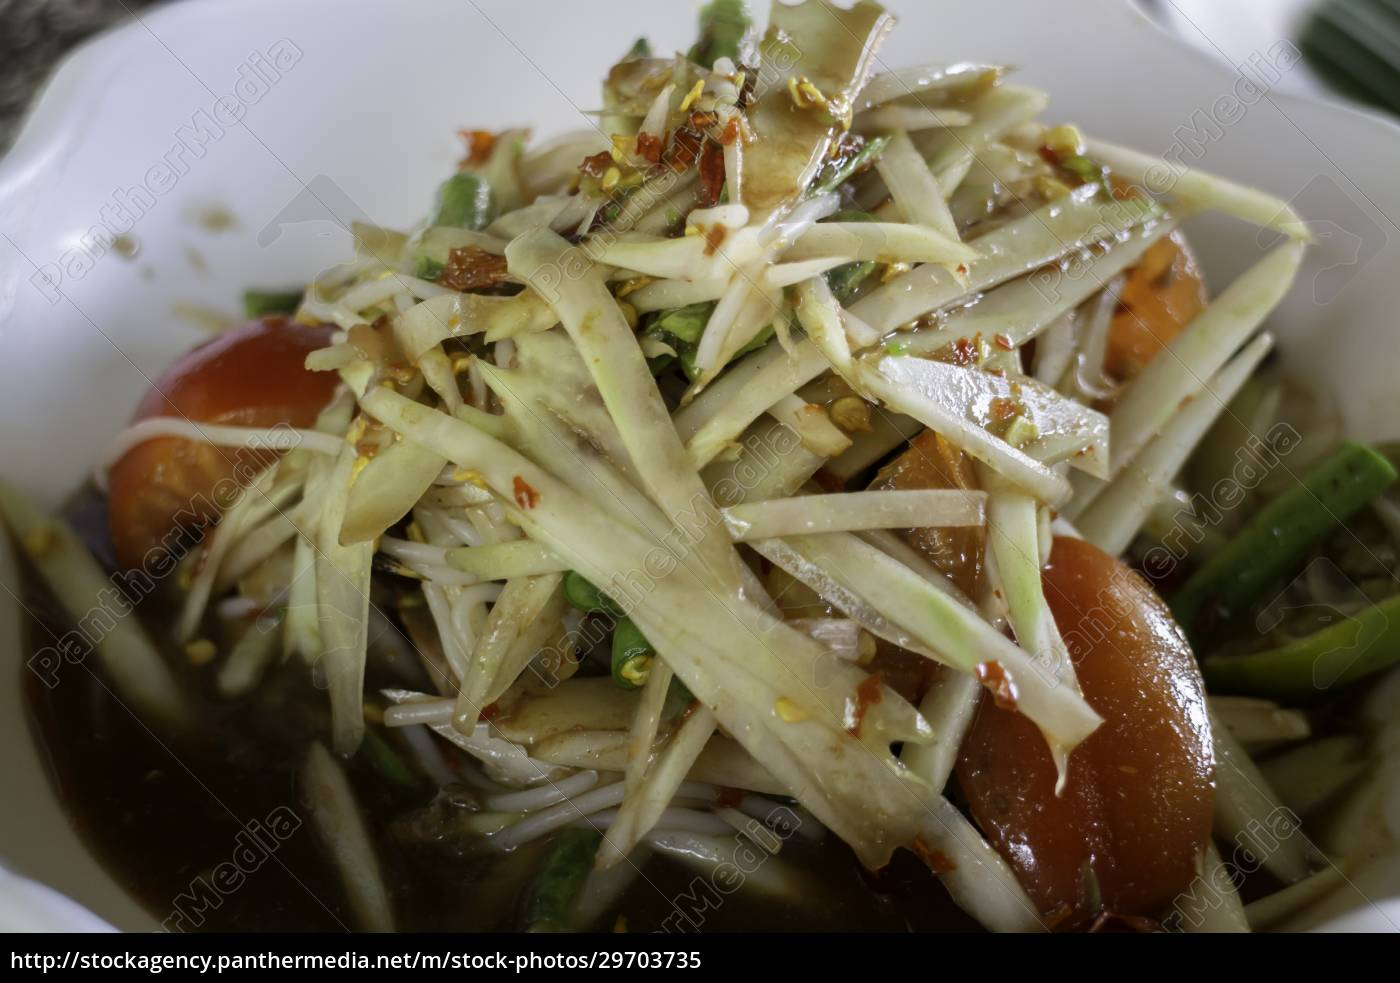 spicy, green, papaya, salad, serve - 29703735